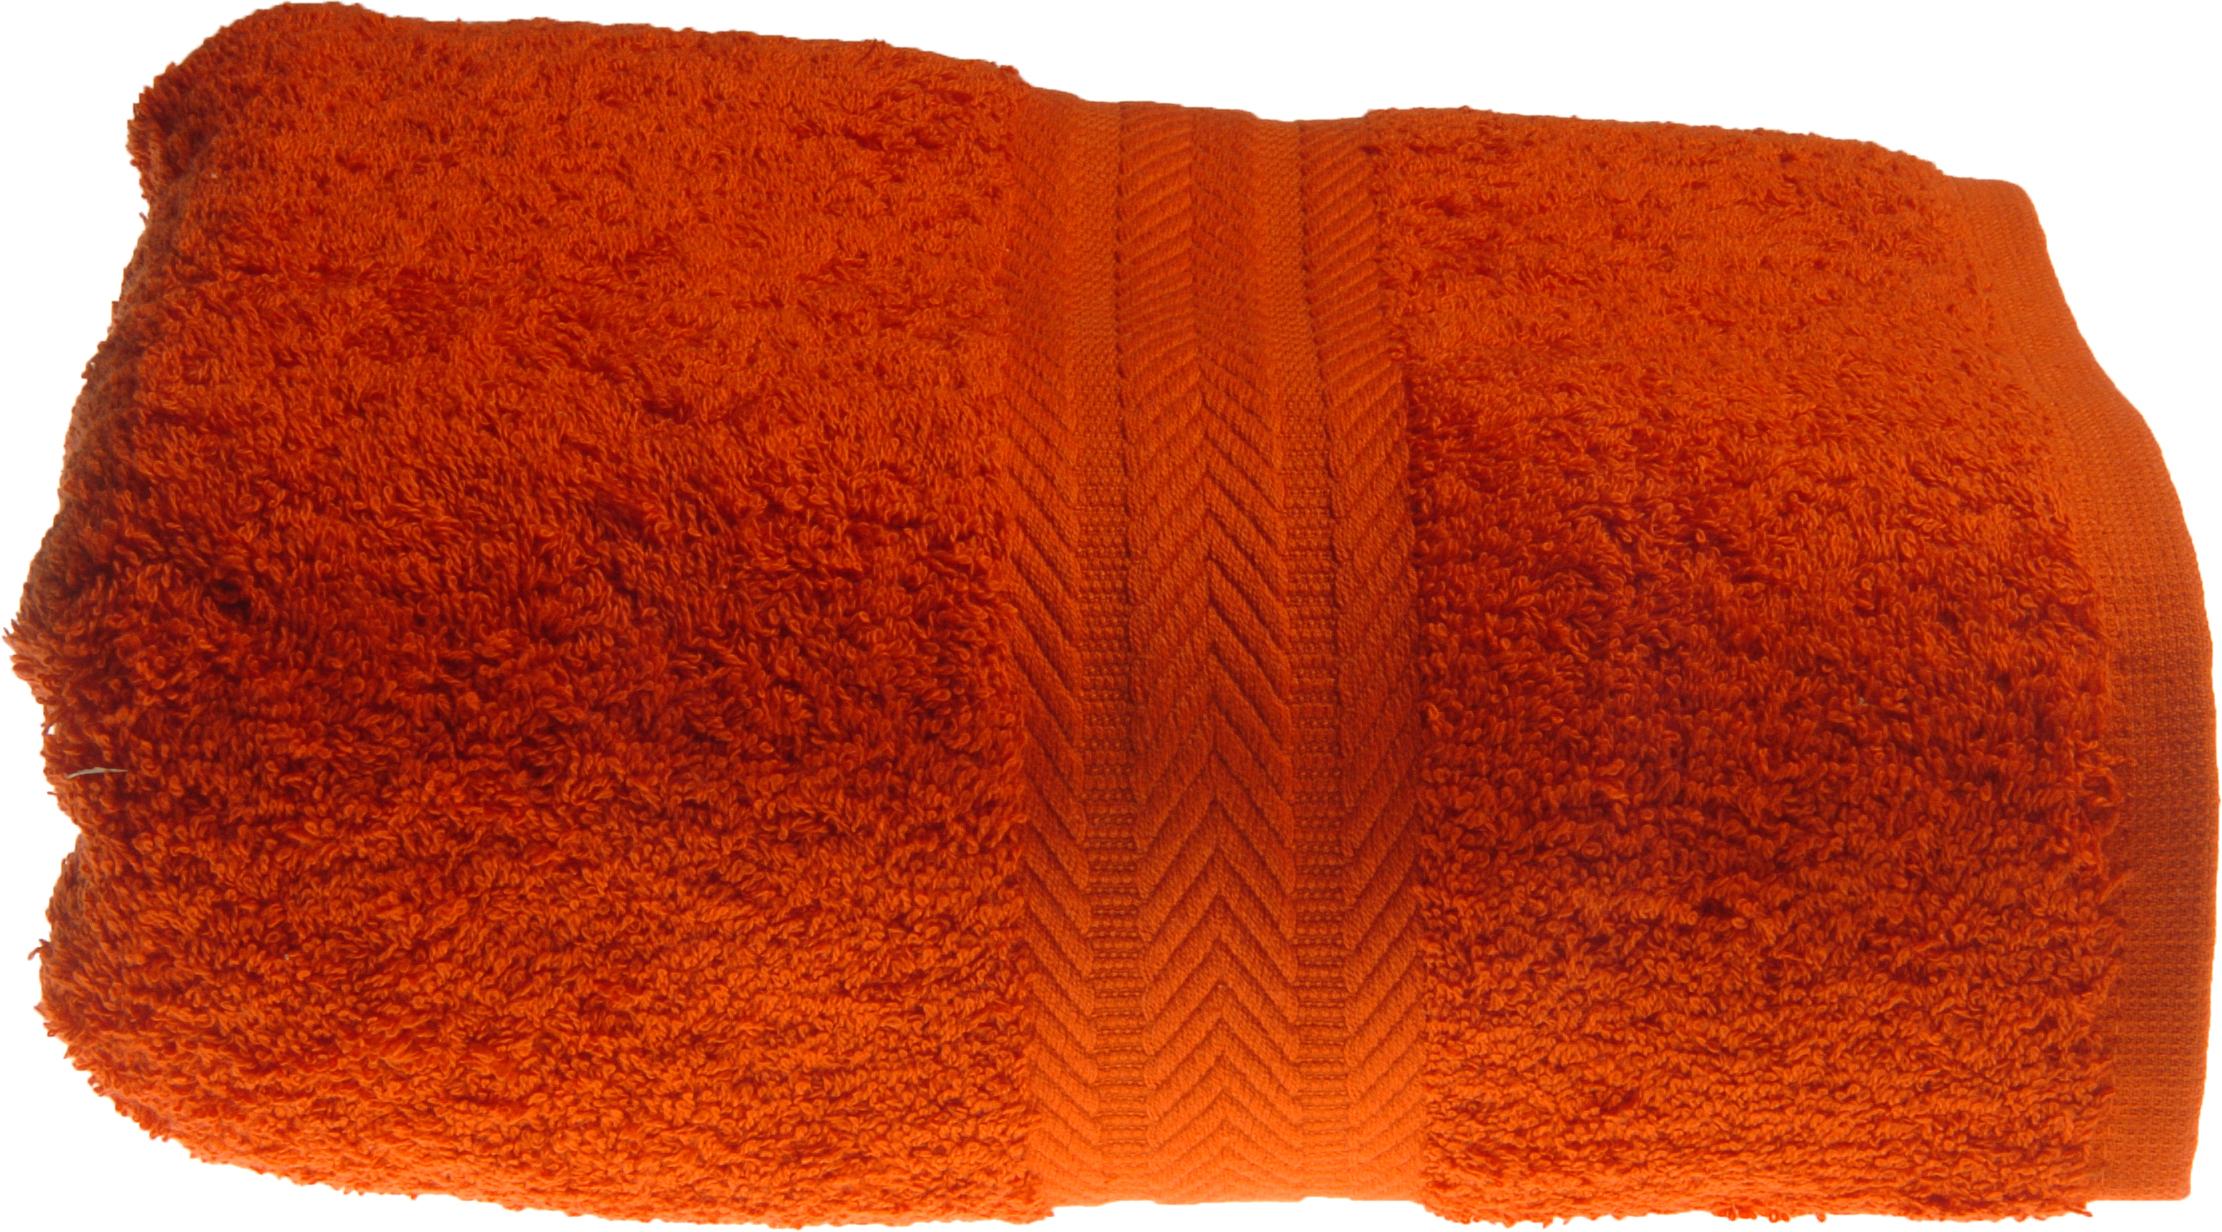 Drap de douche 70x140 cm Terracota (Terracota)